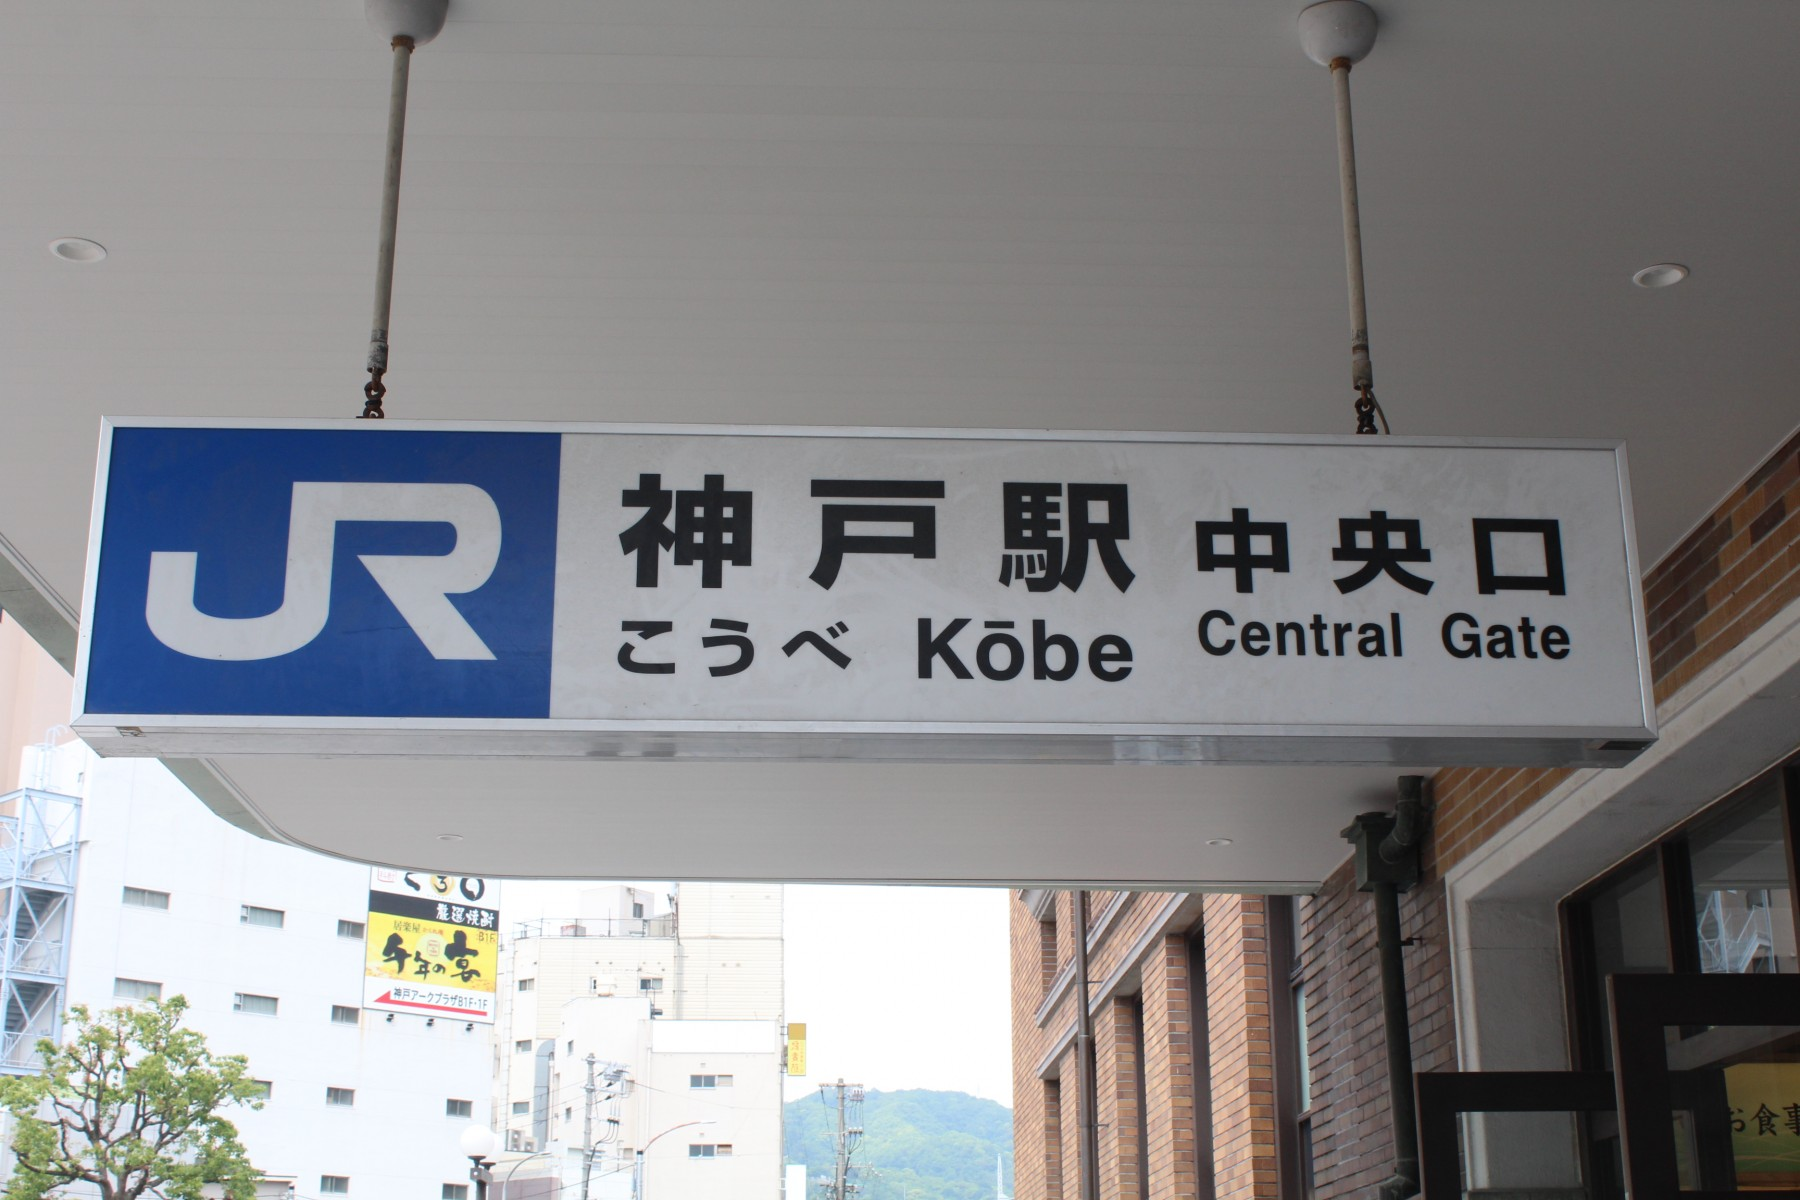 ①JR神戸駅中央口の改札を出て左(ロータリー側)に進んでください